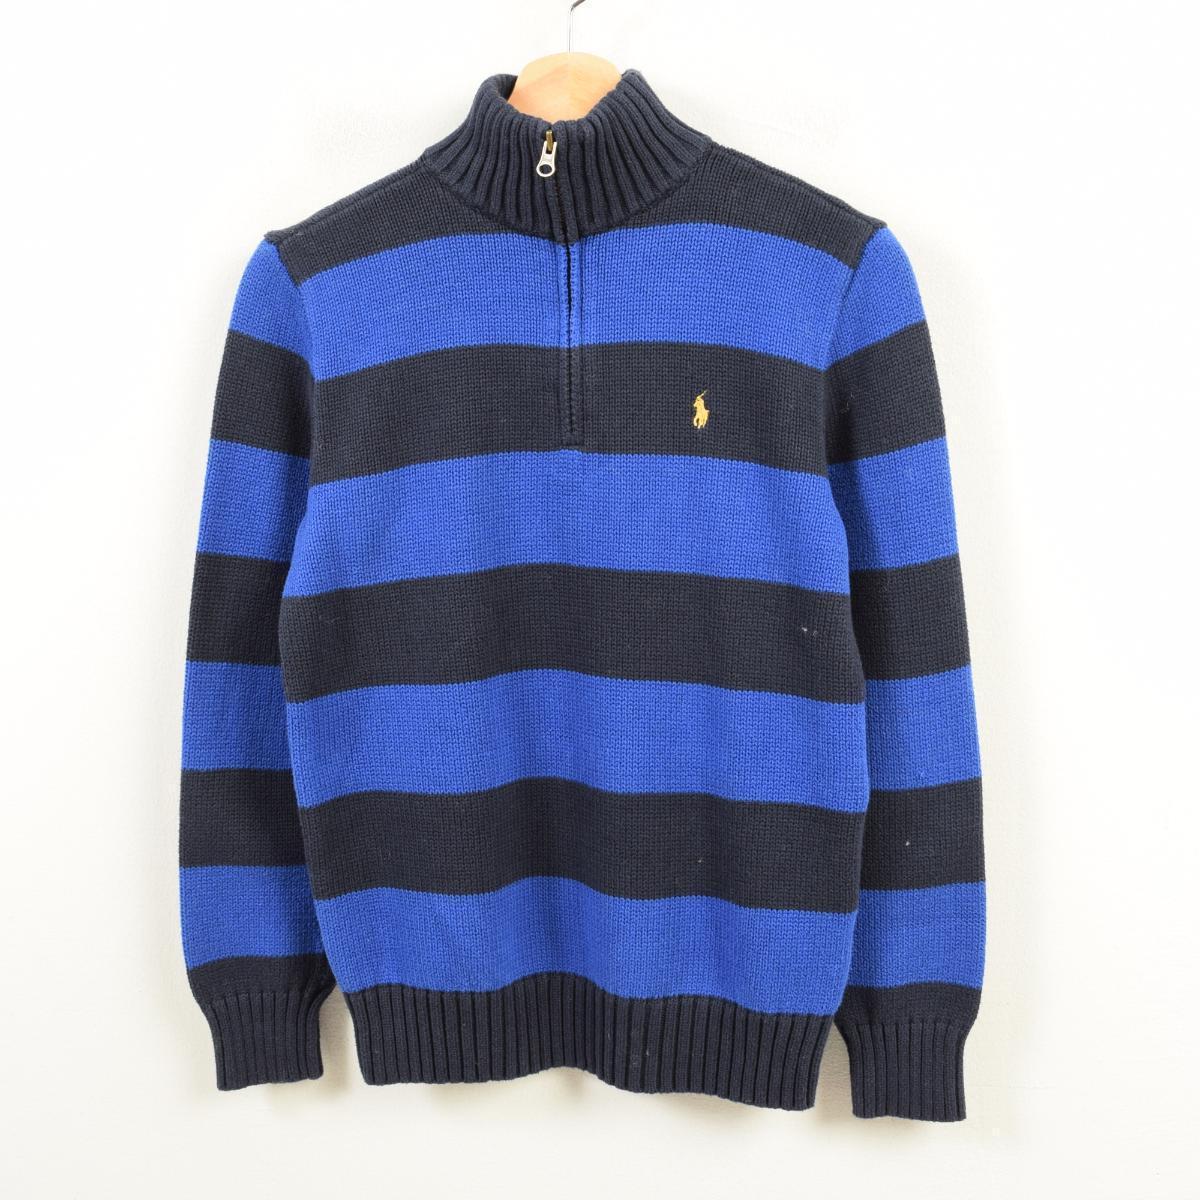 890cdcc6c Ralph Lauren Ralph Lauren POLO by Ralph Lauren horizontal stripes cotton  knit half zip sweater Lady s L  was9470